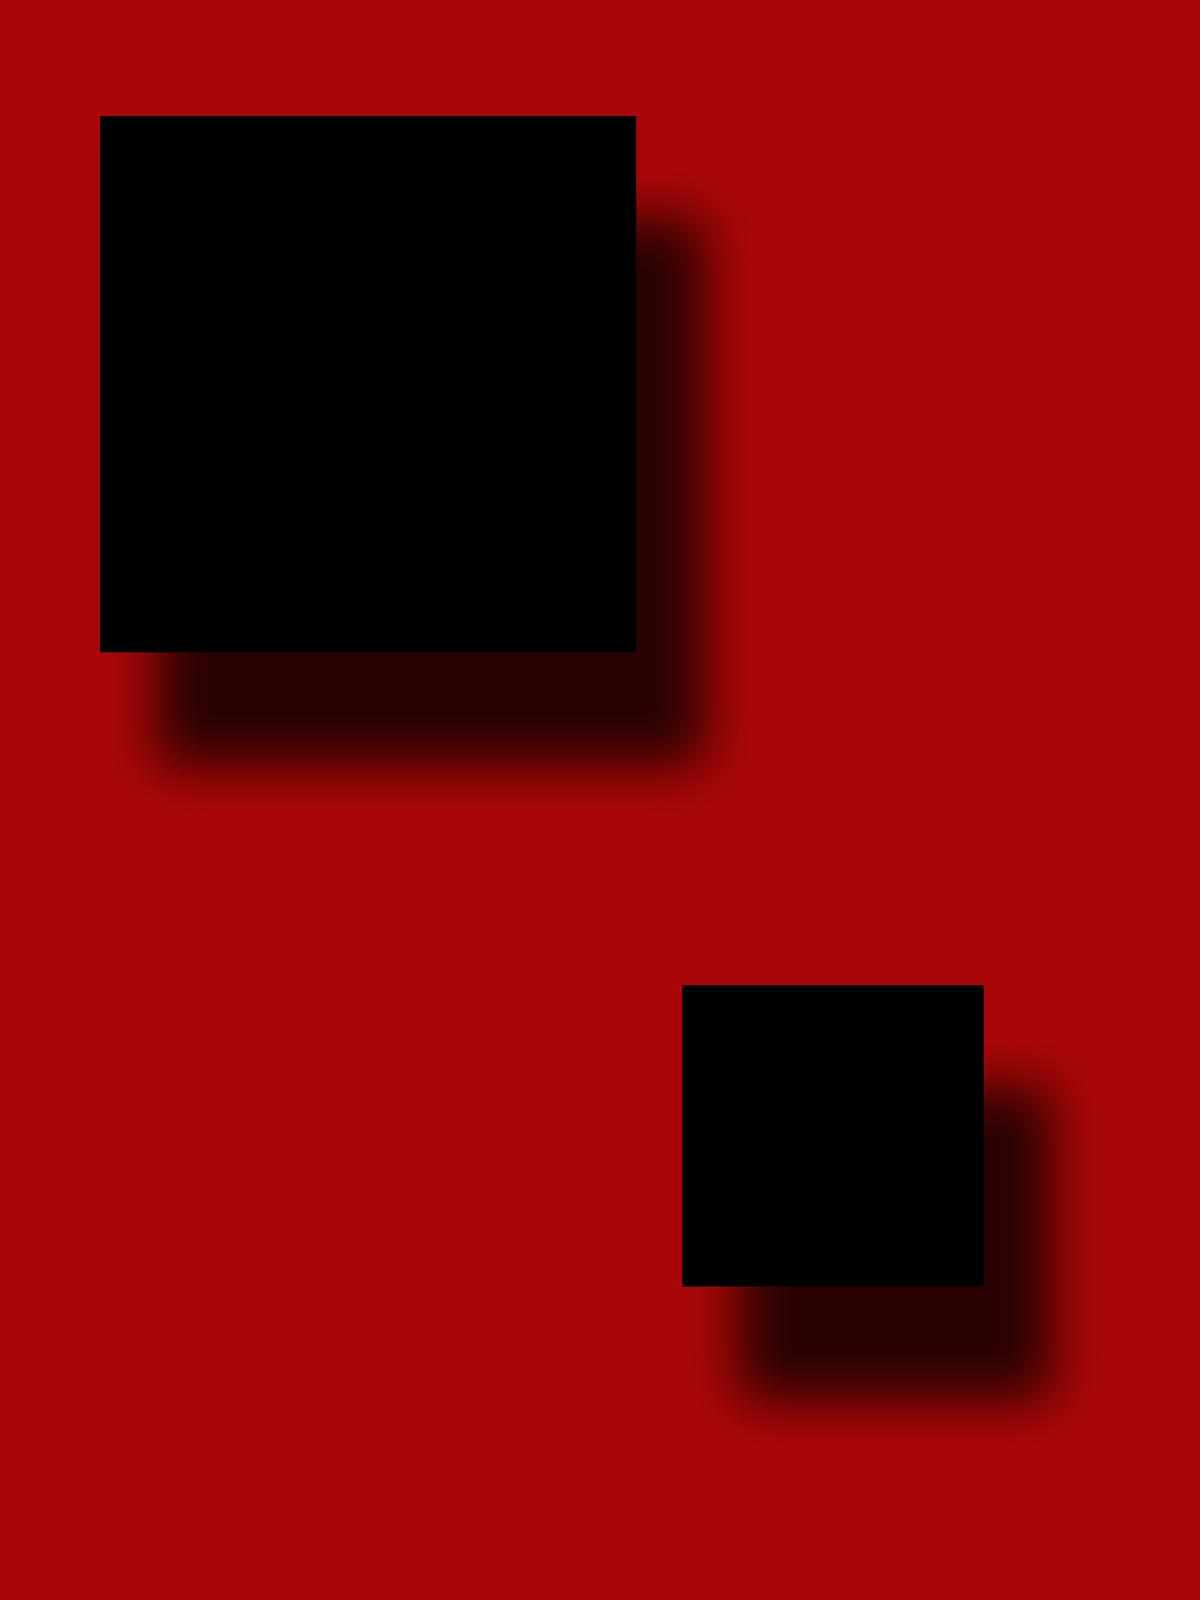 Red and Black Wallpapers red and black wallpapers Widescreen 1200x1600